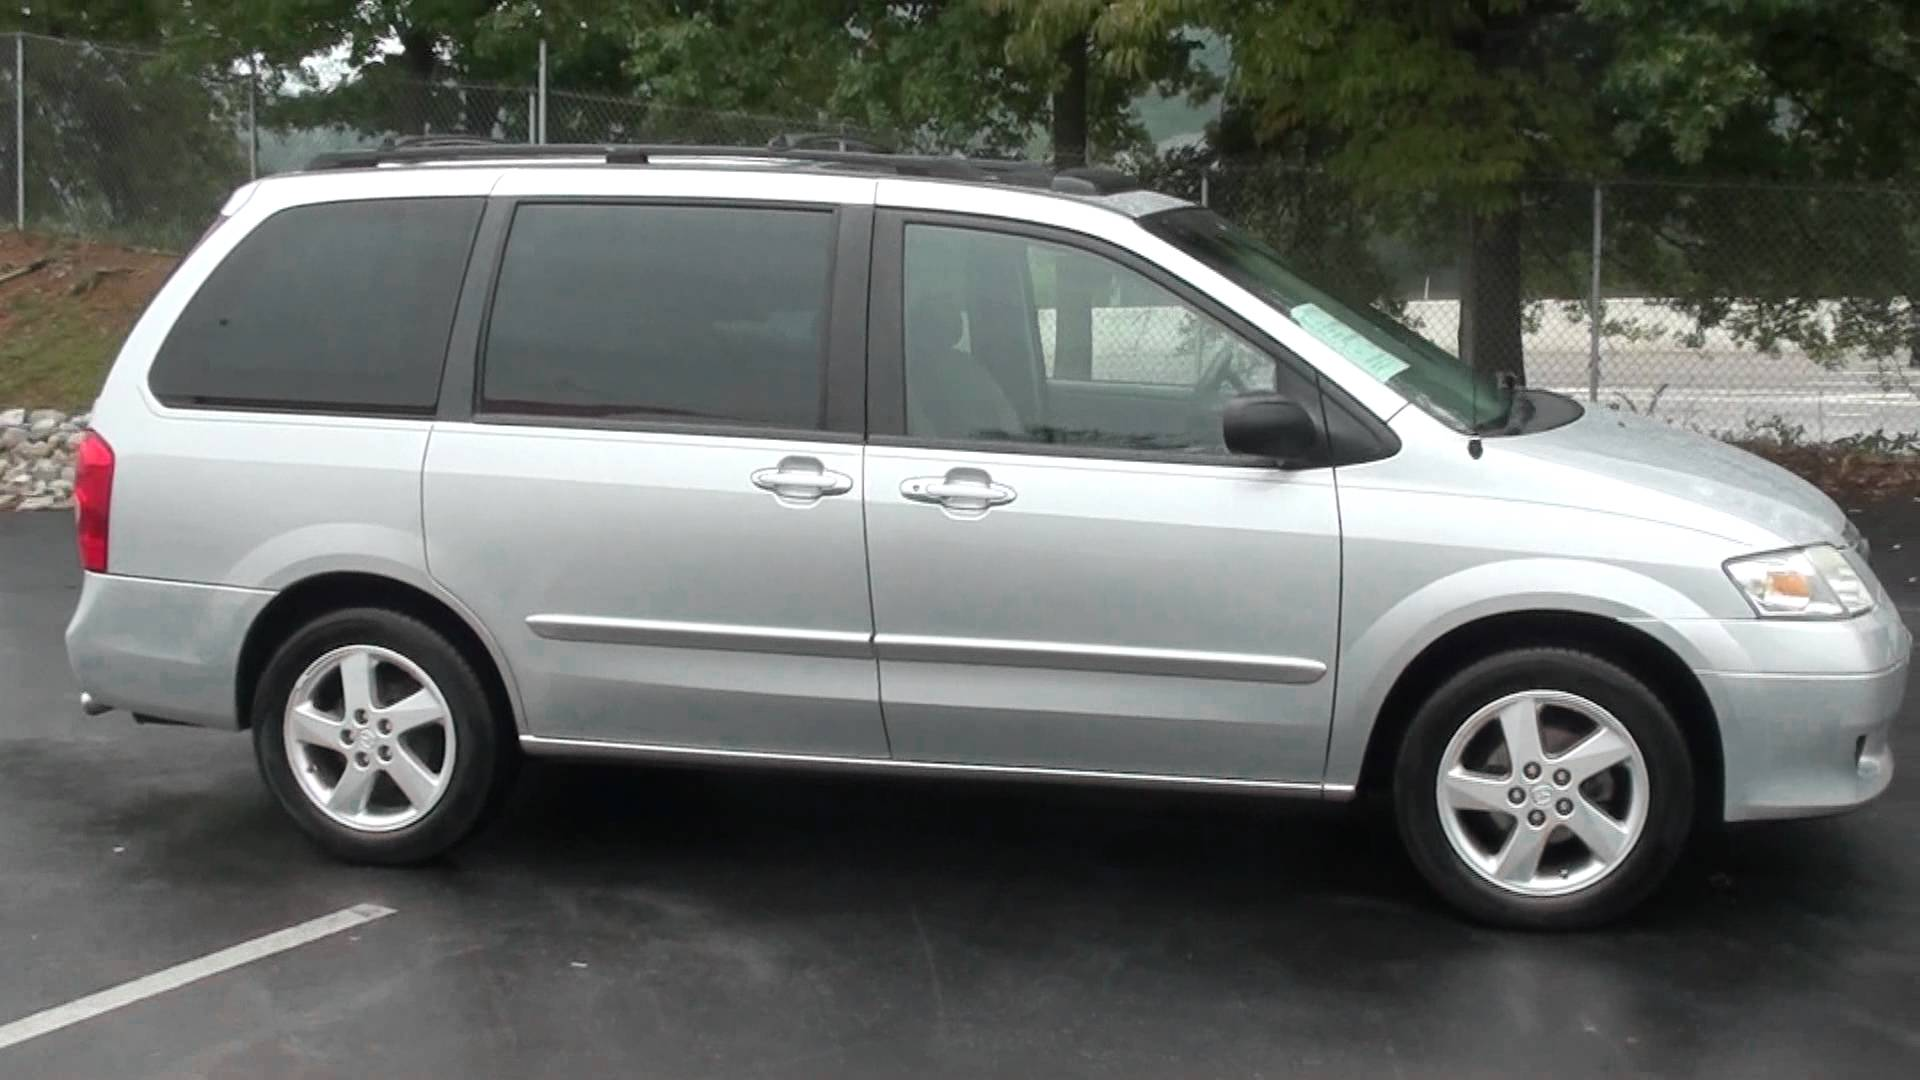 2003 Mazda Mpv Image 14